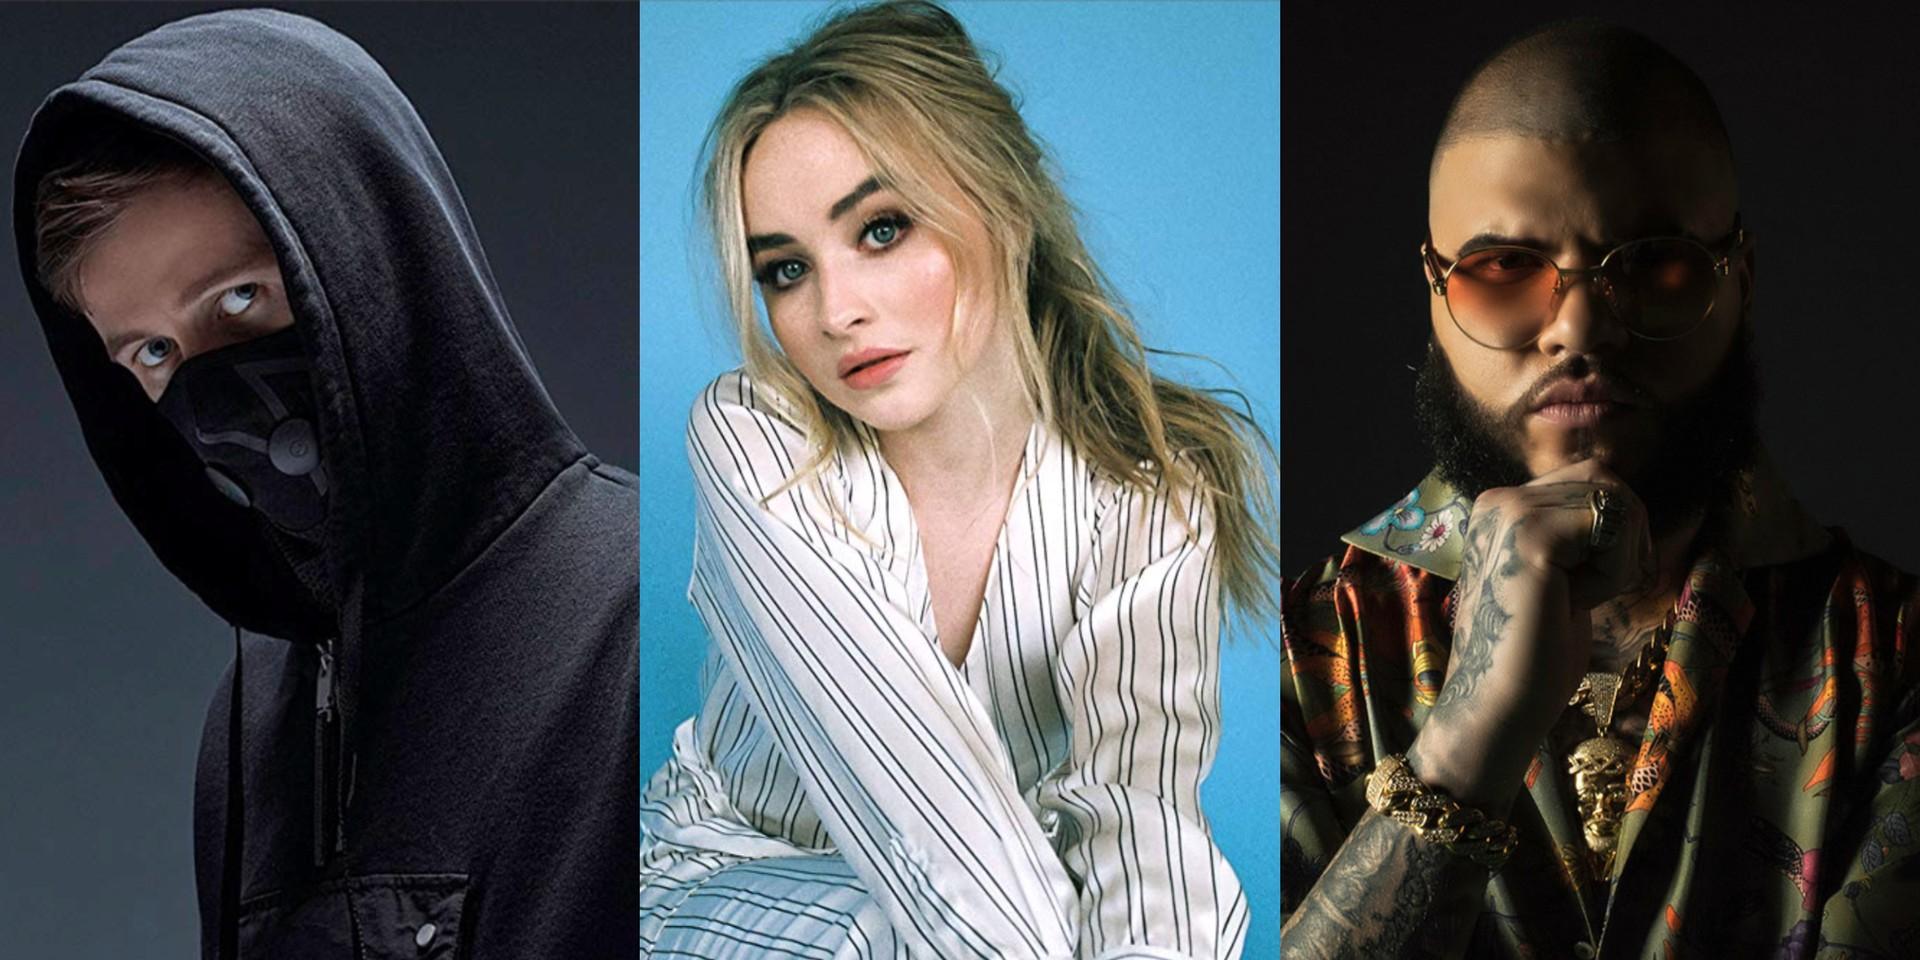 Alan Walker, Sabrina Carpenter and Farruko release future bass single 'On My Way' – listen